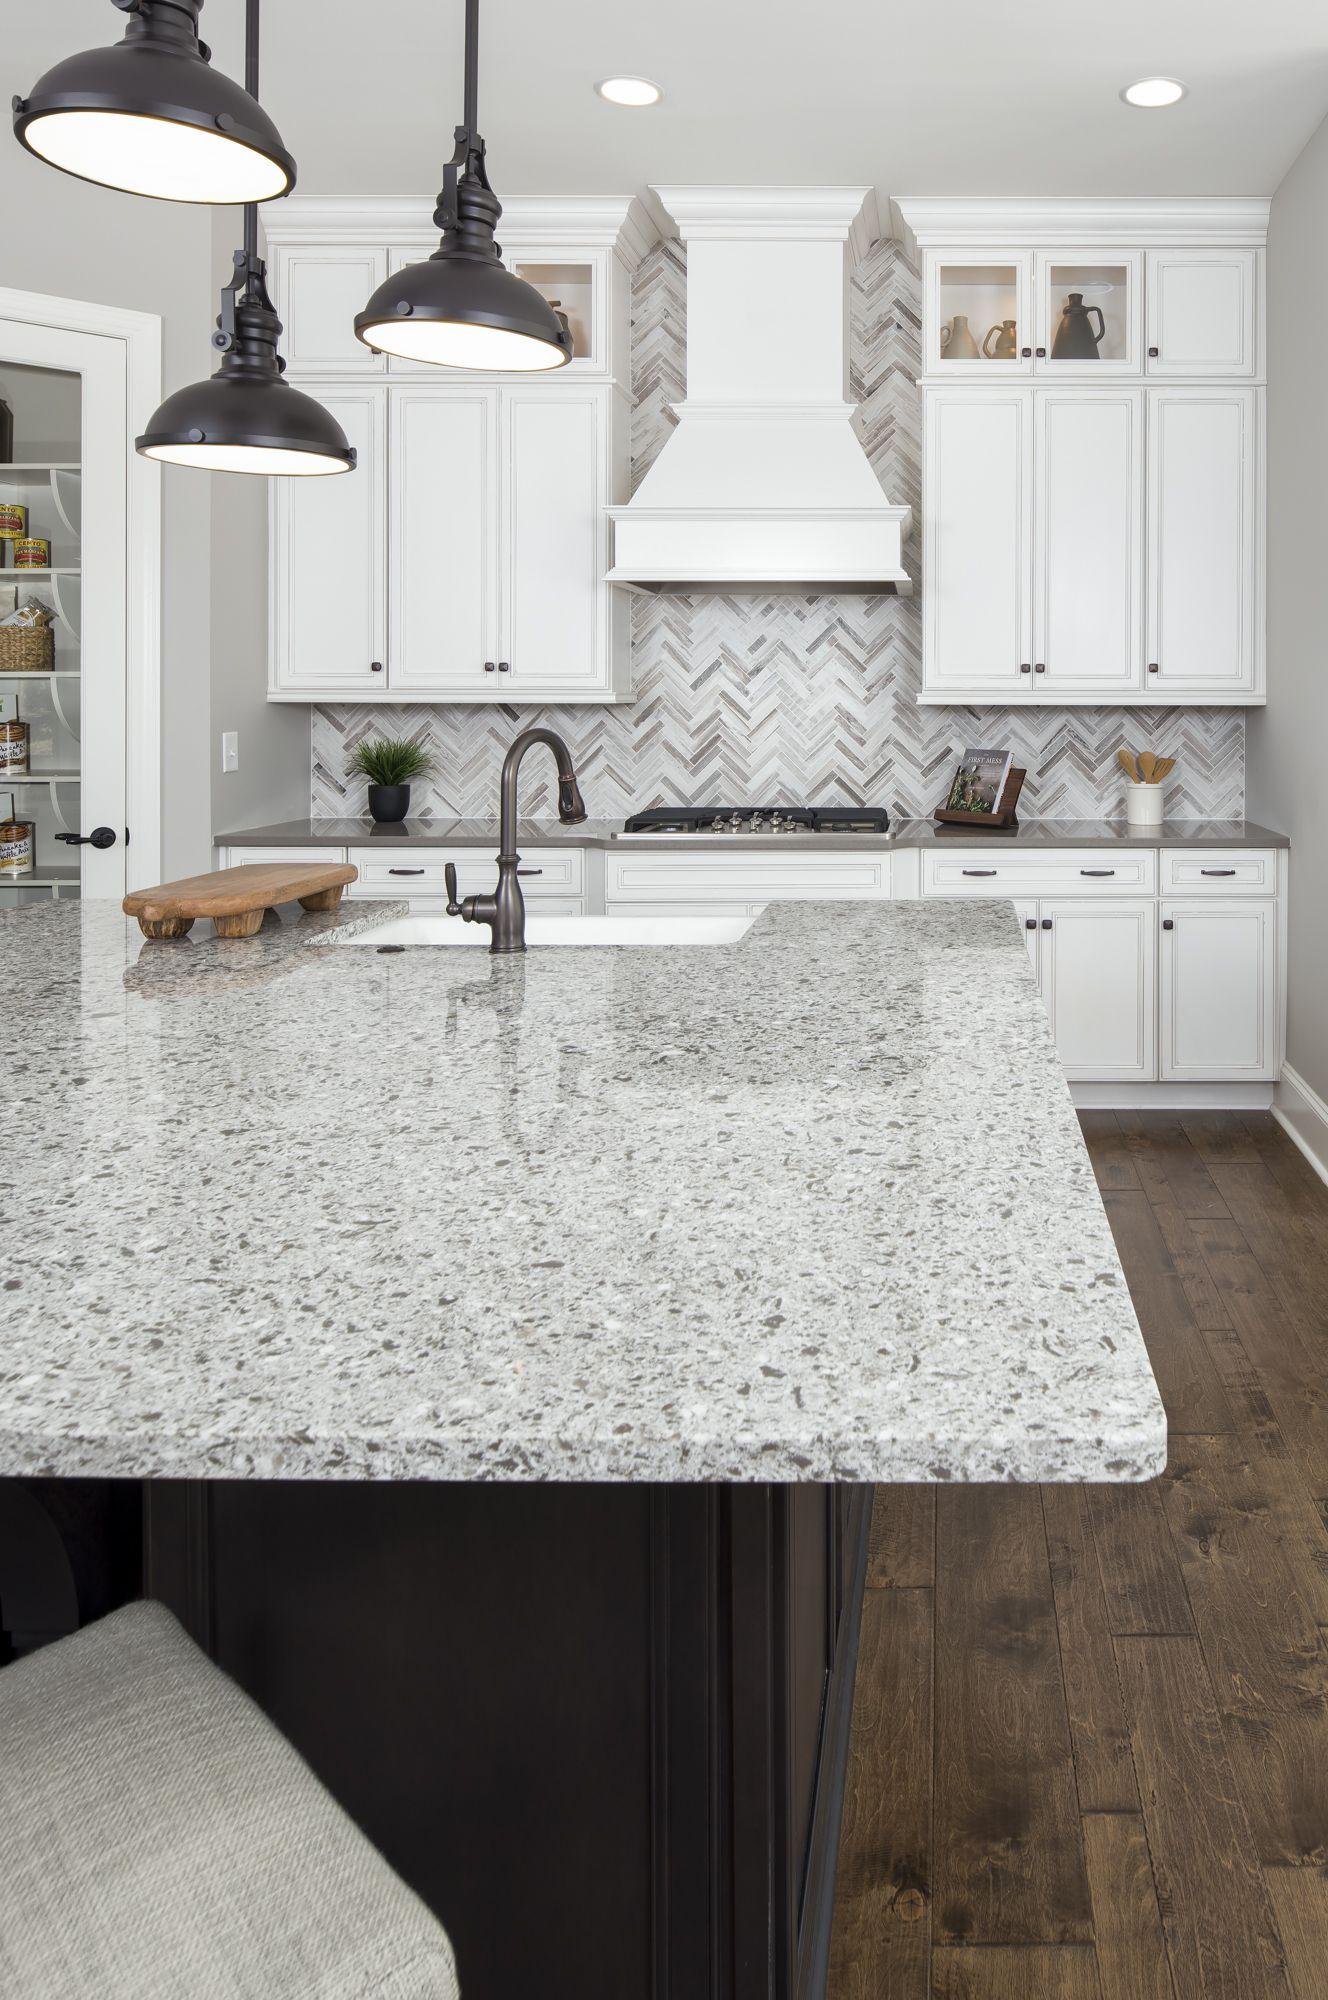 Herringbone Mosaic Backsplash Grey And White Quartz Countertops